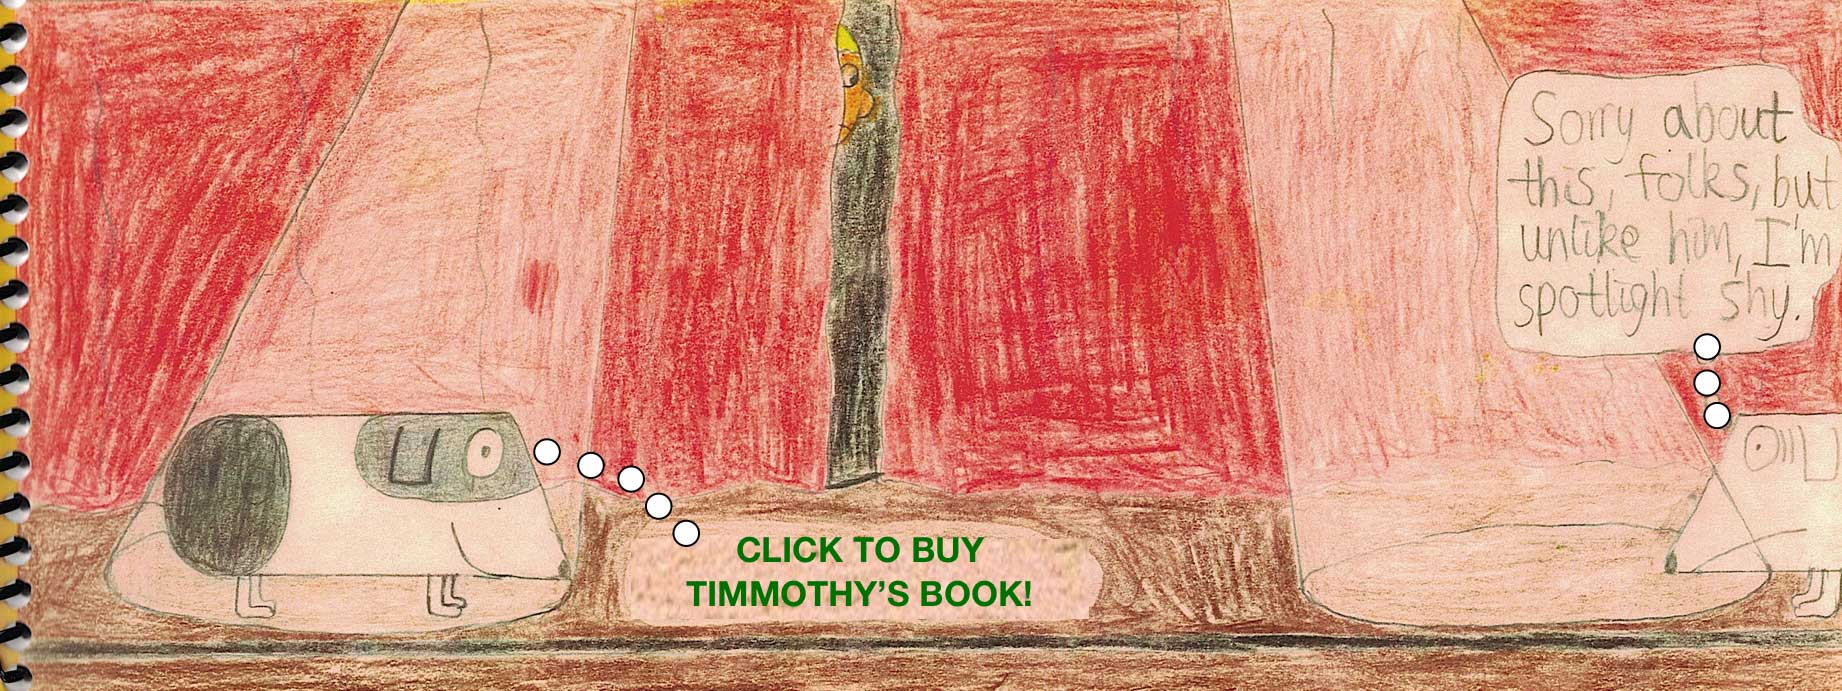 timmothy_Timm_book_1.jpg